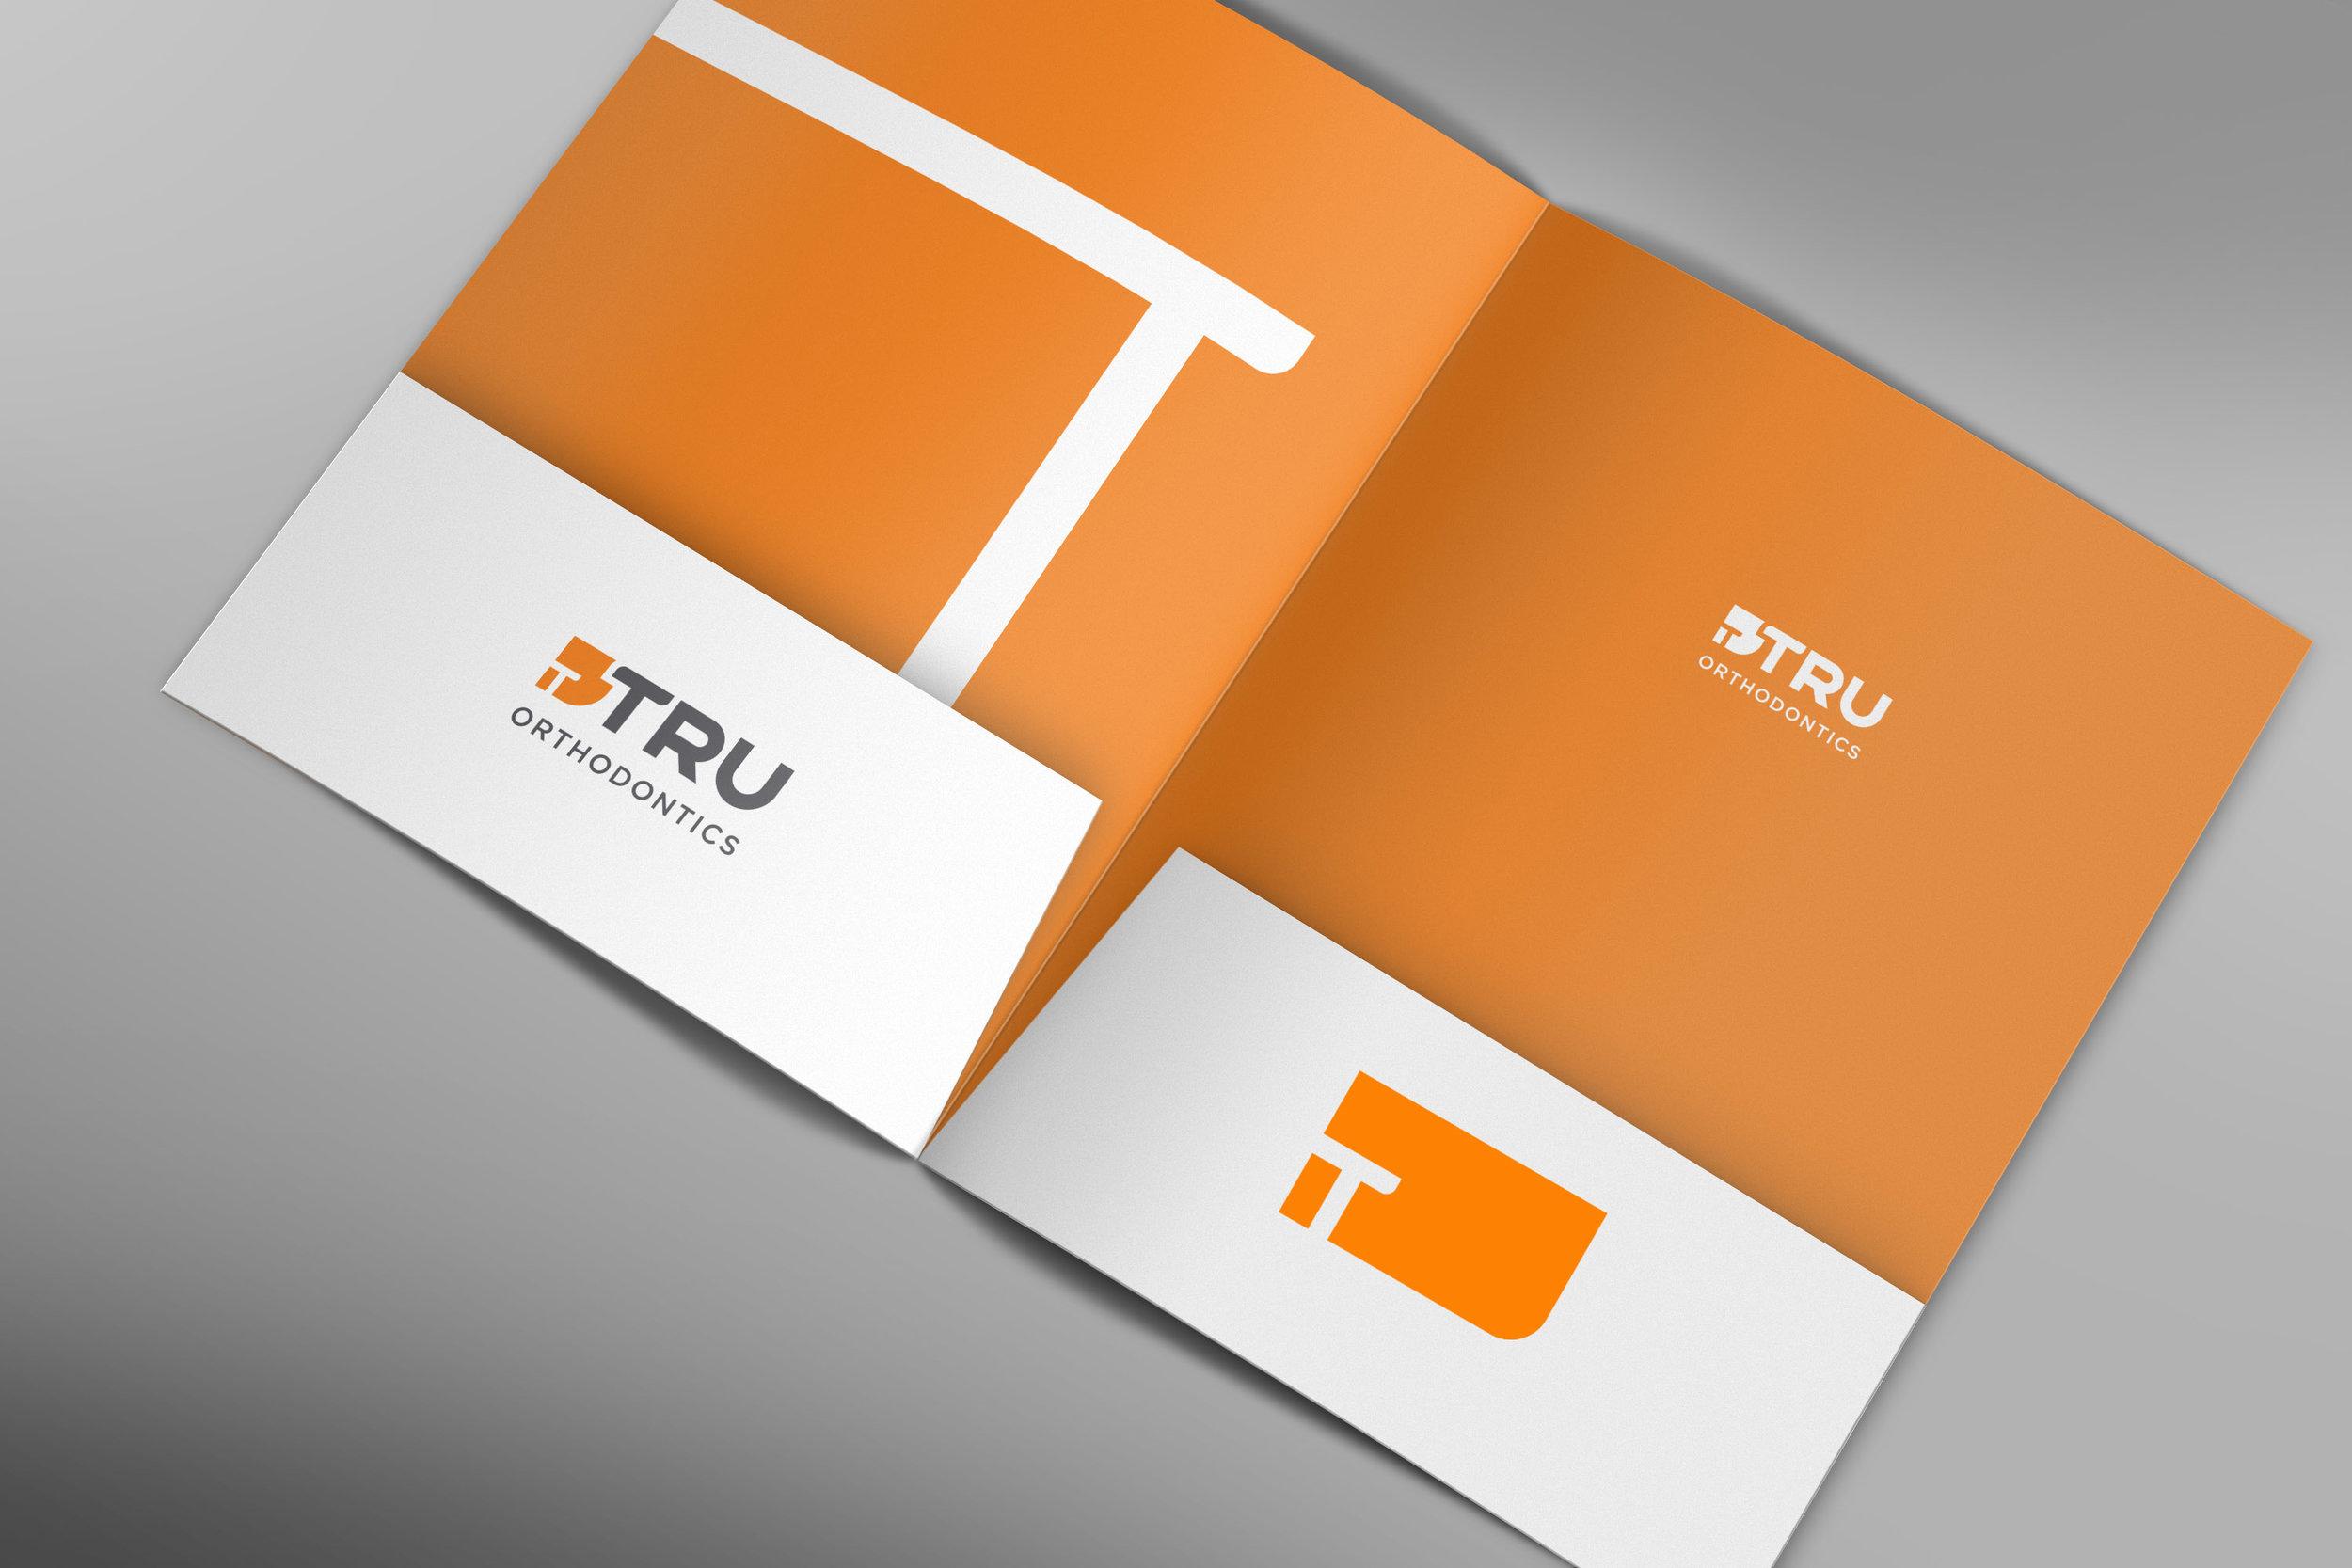 View More Print Design / Graphic Design Samples >